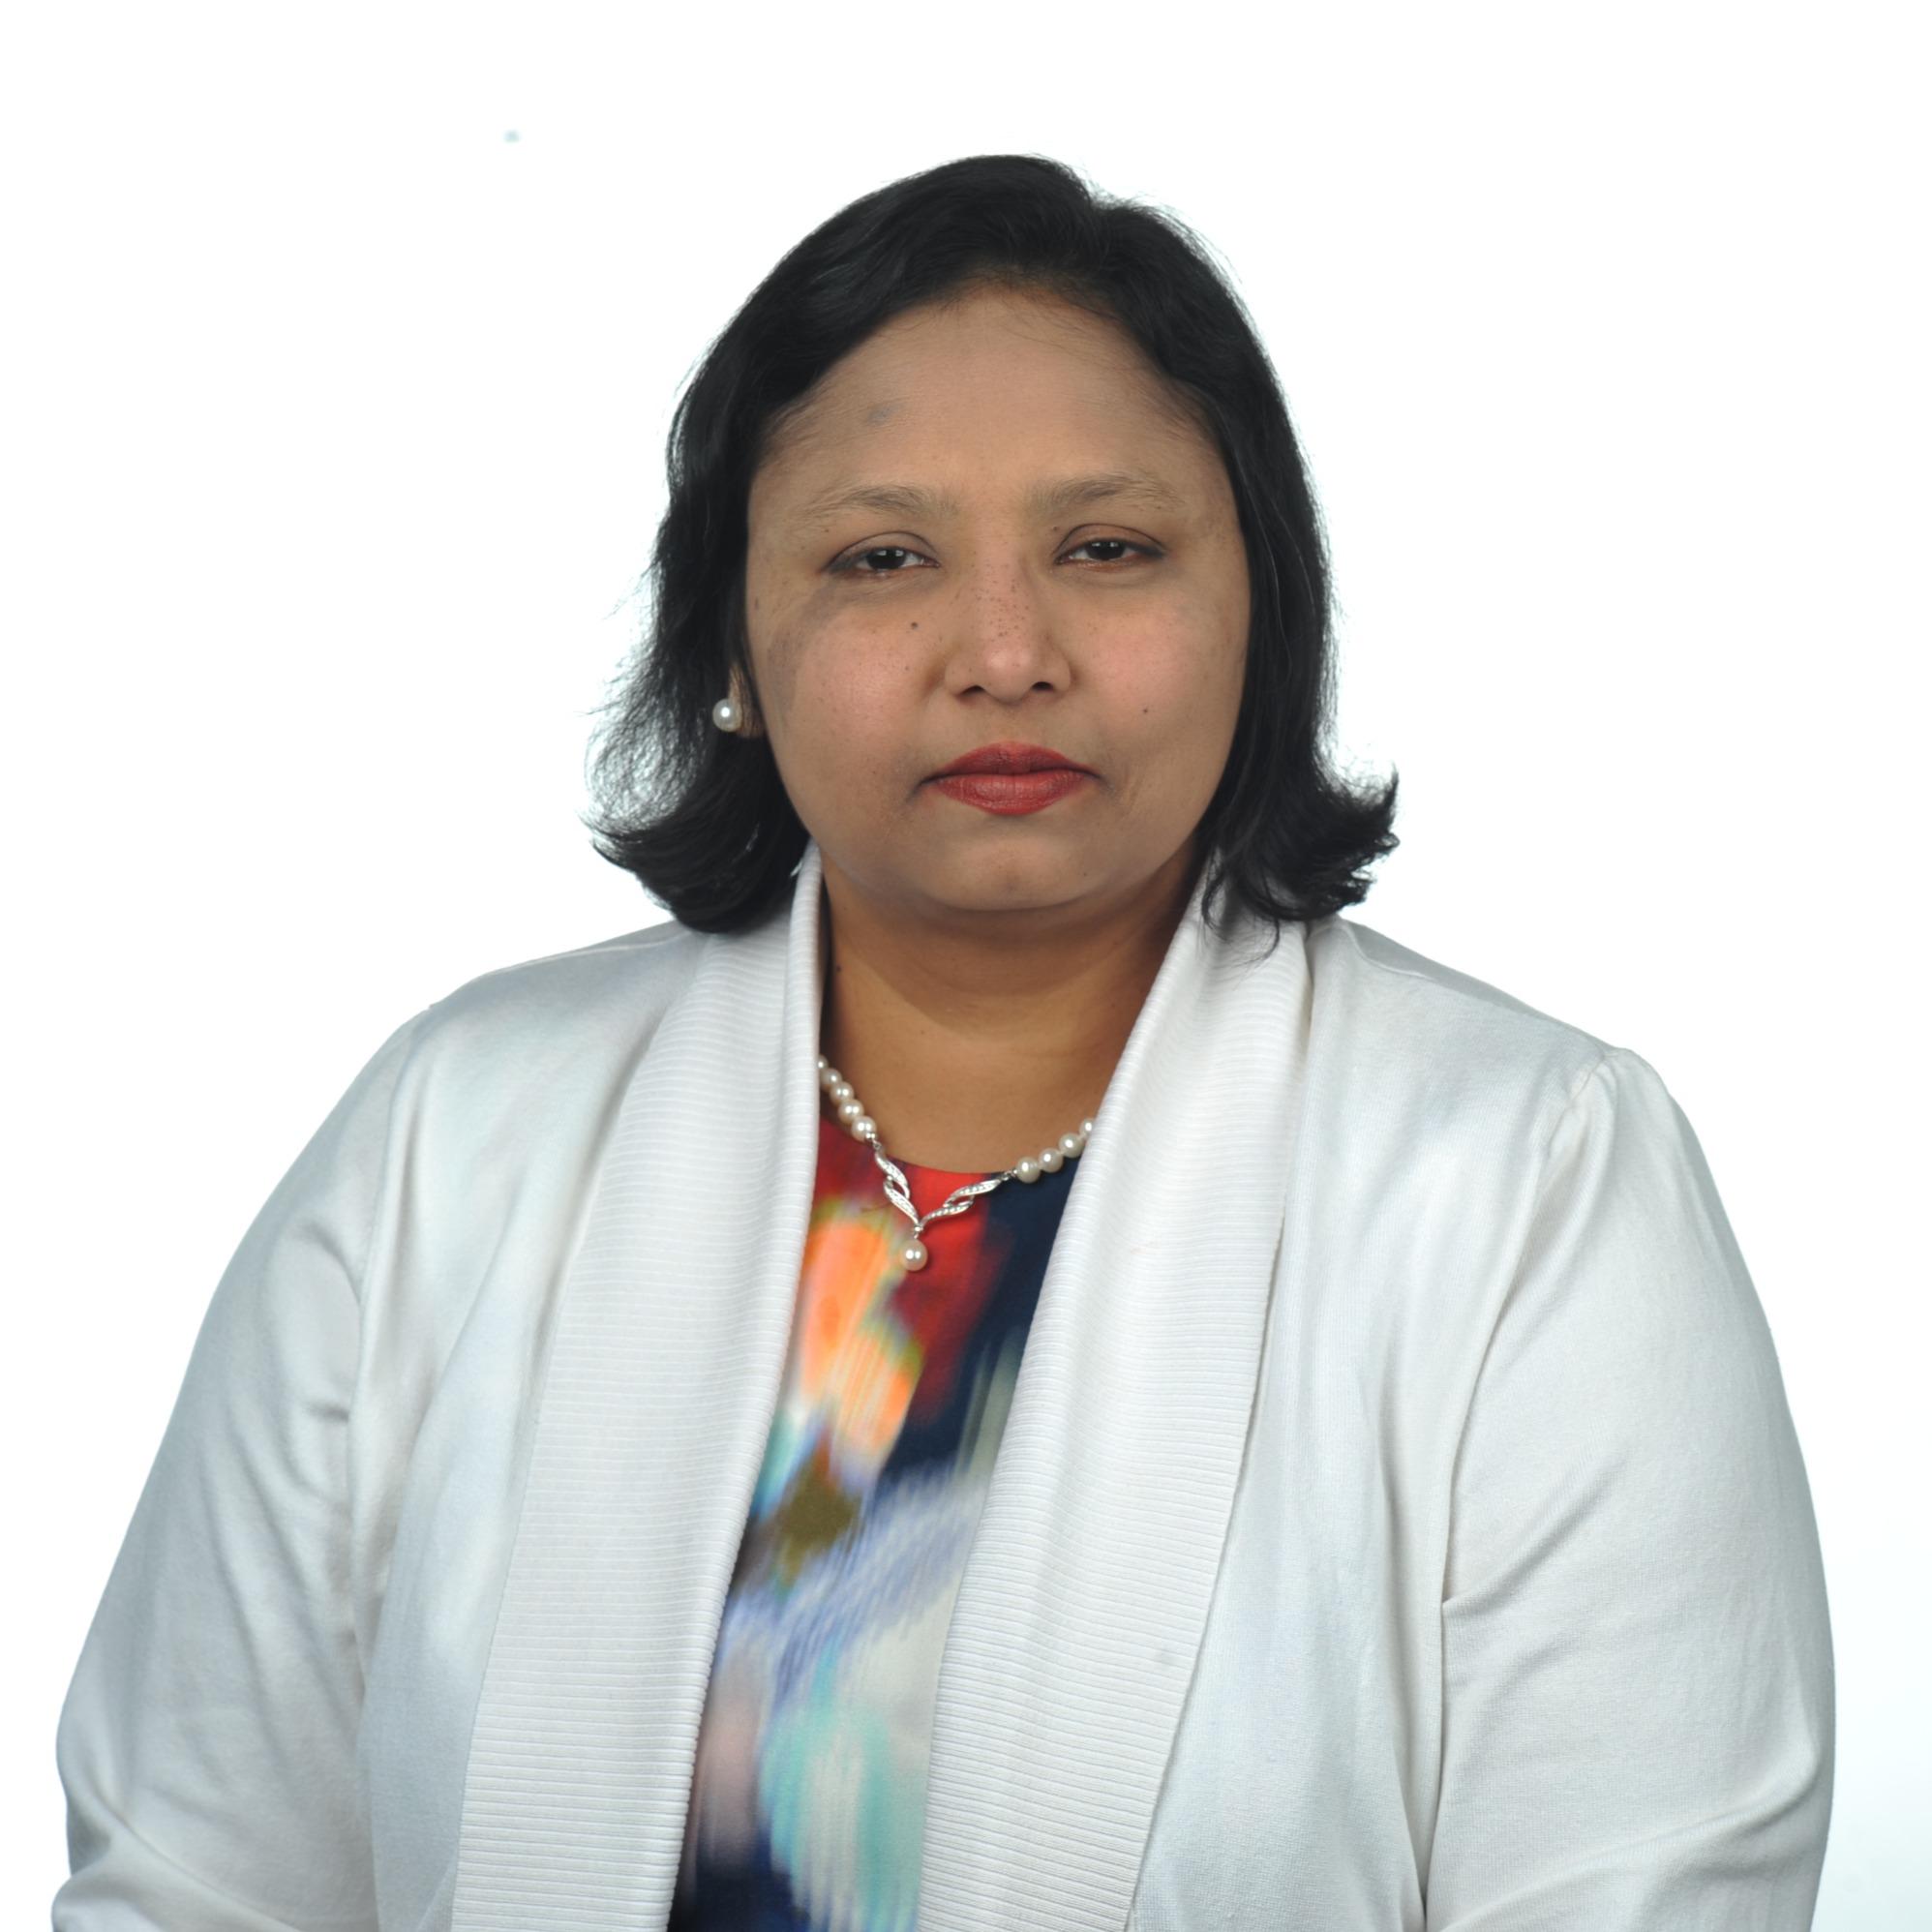 Hemalatha Manickavinayaham